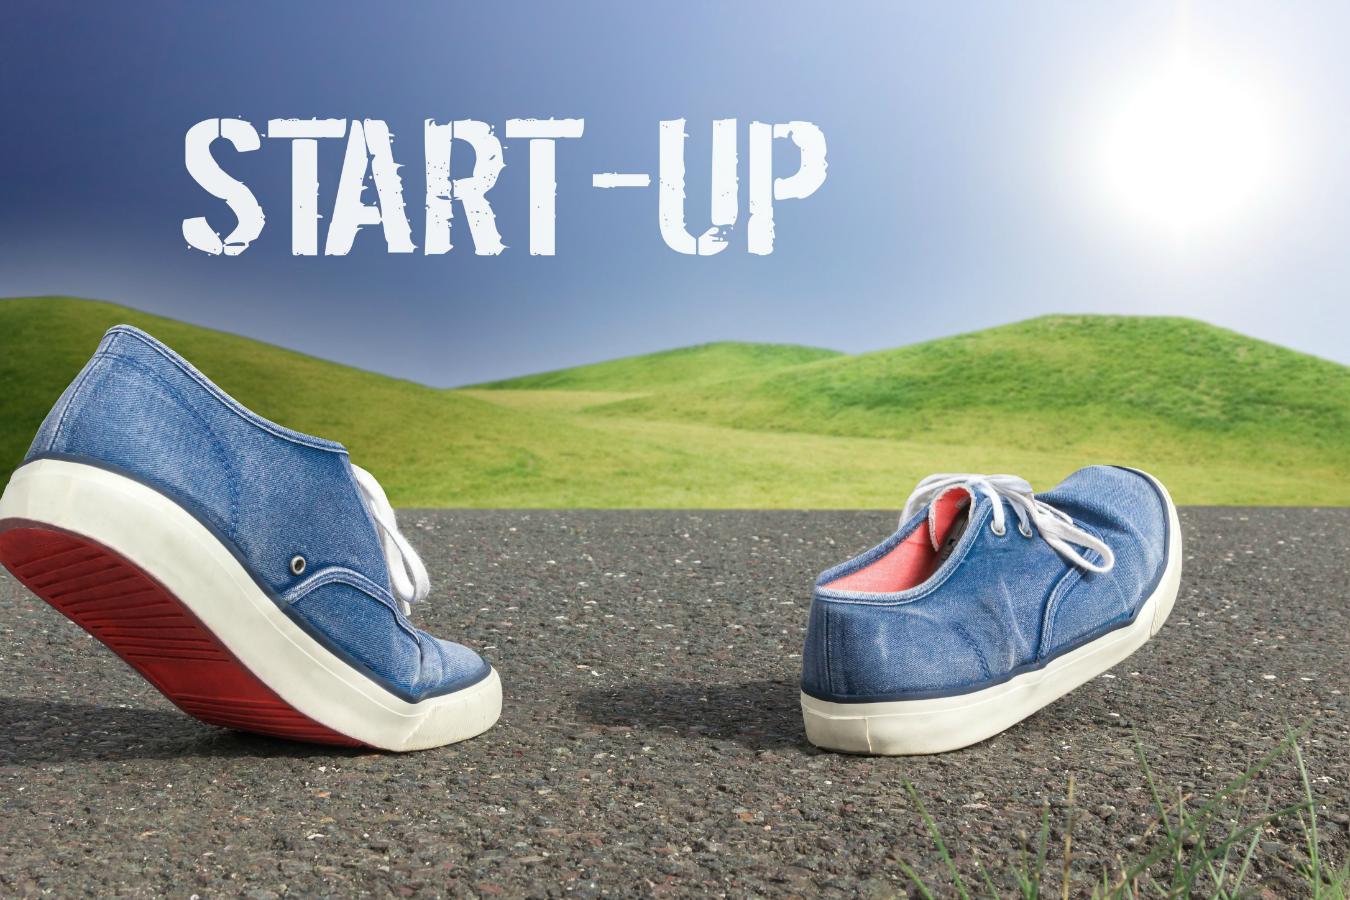 What Happens When Enterprises Partner With Startups?